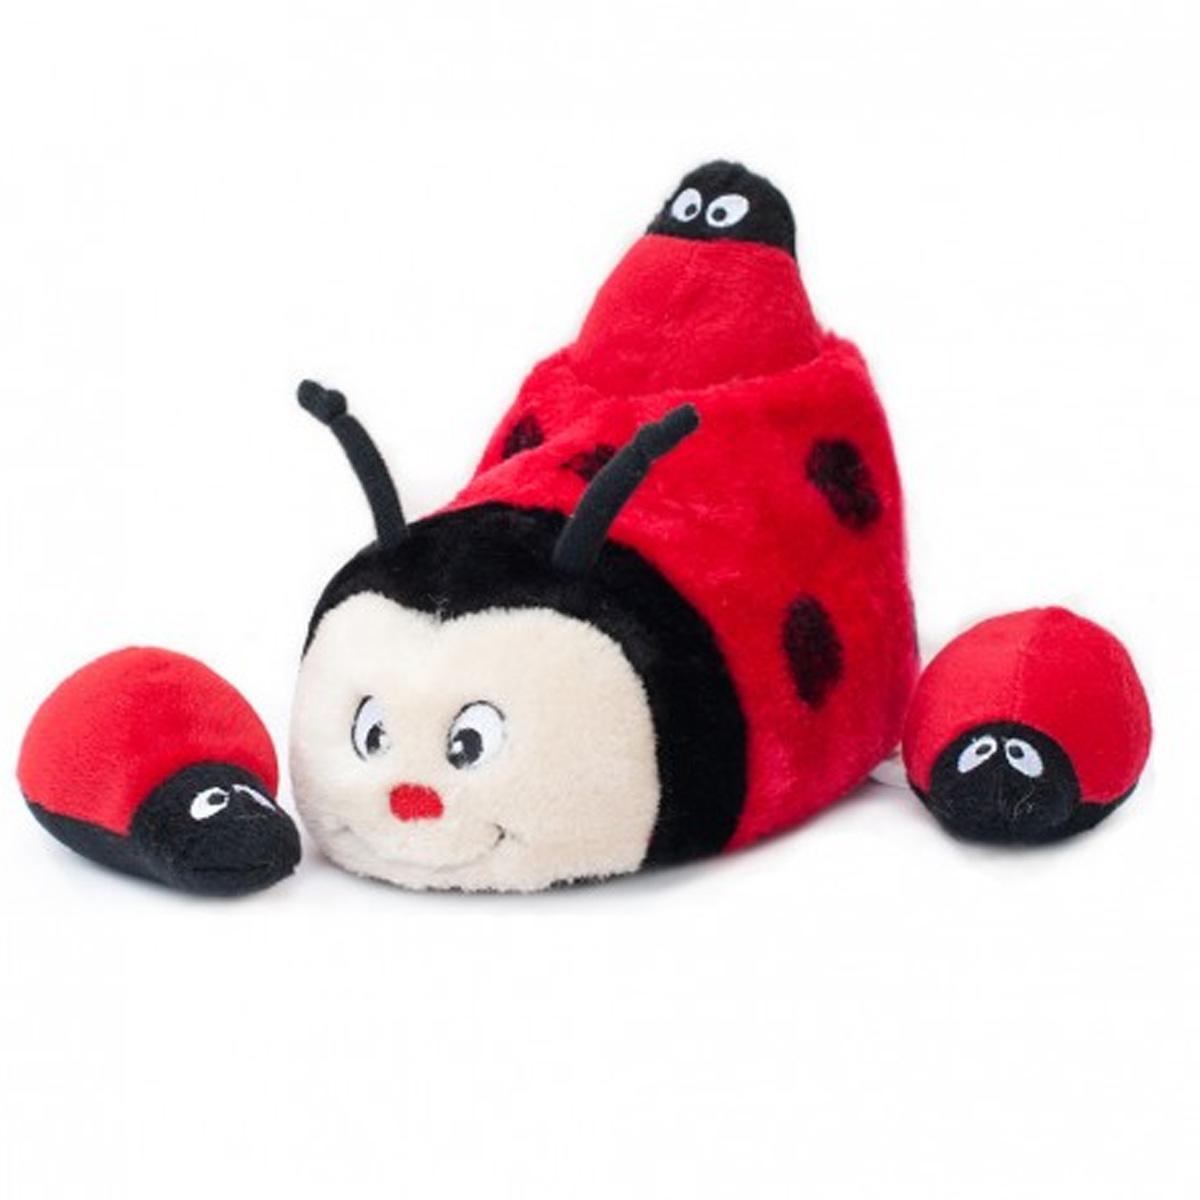 ZippyPaws Slipper Nest Dog Toy - Ladybug